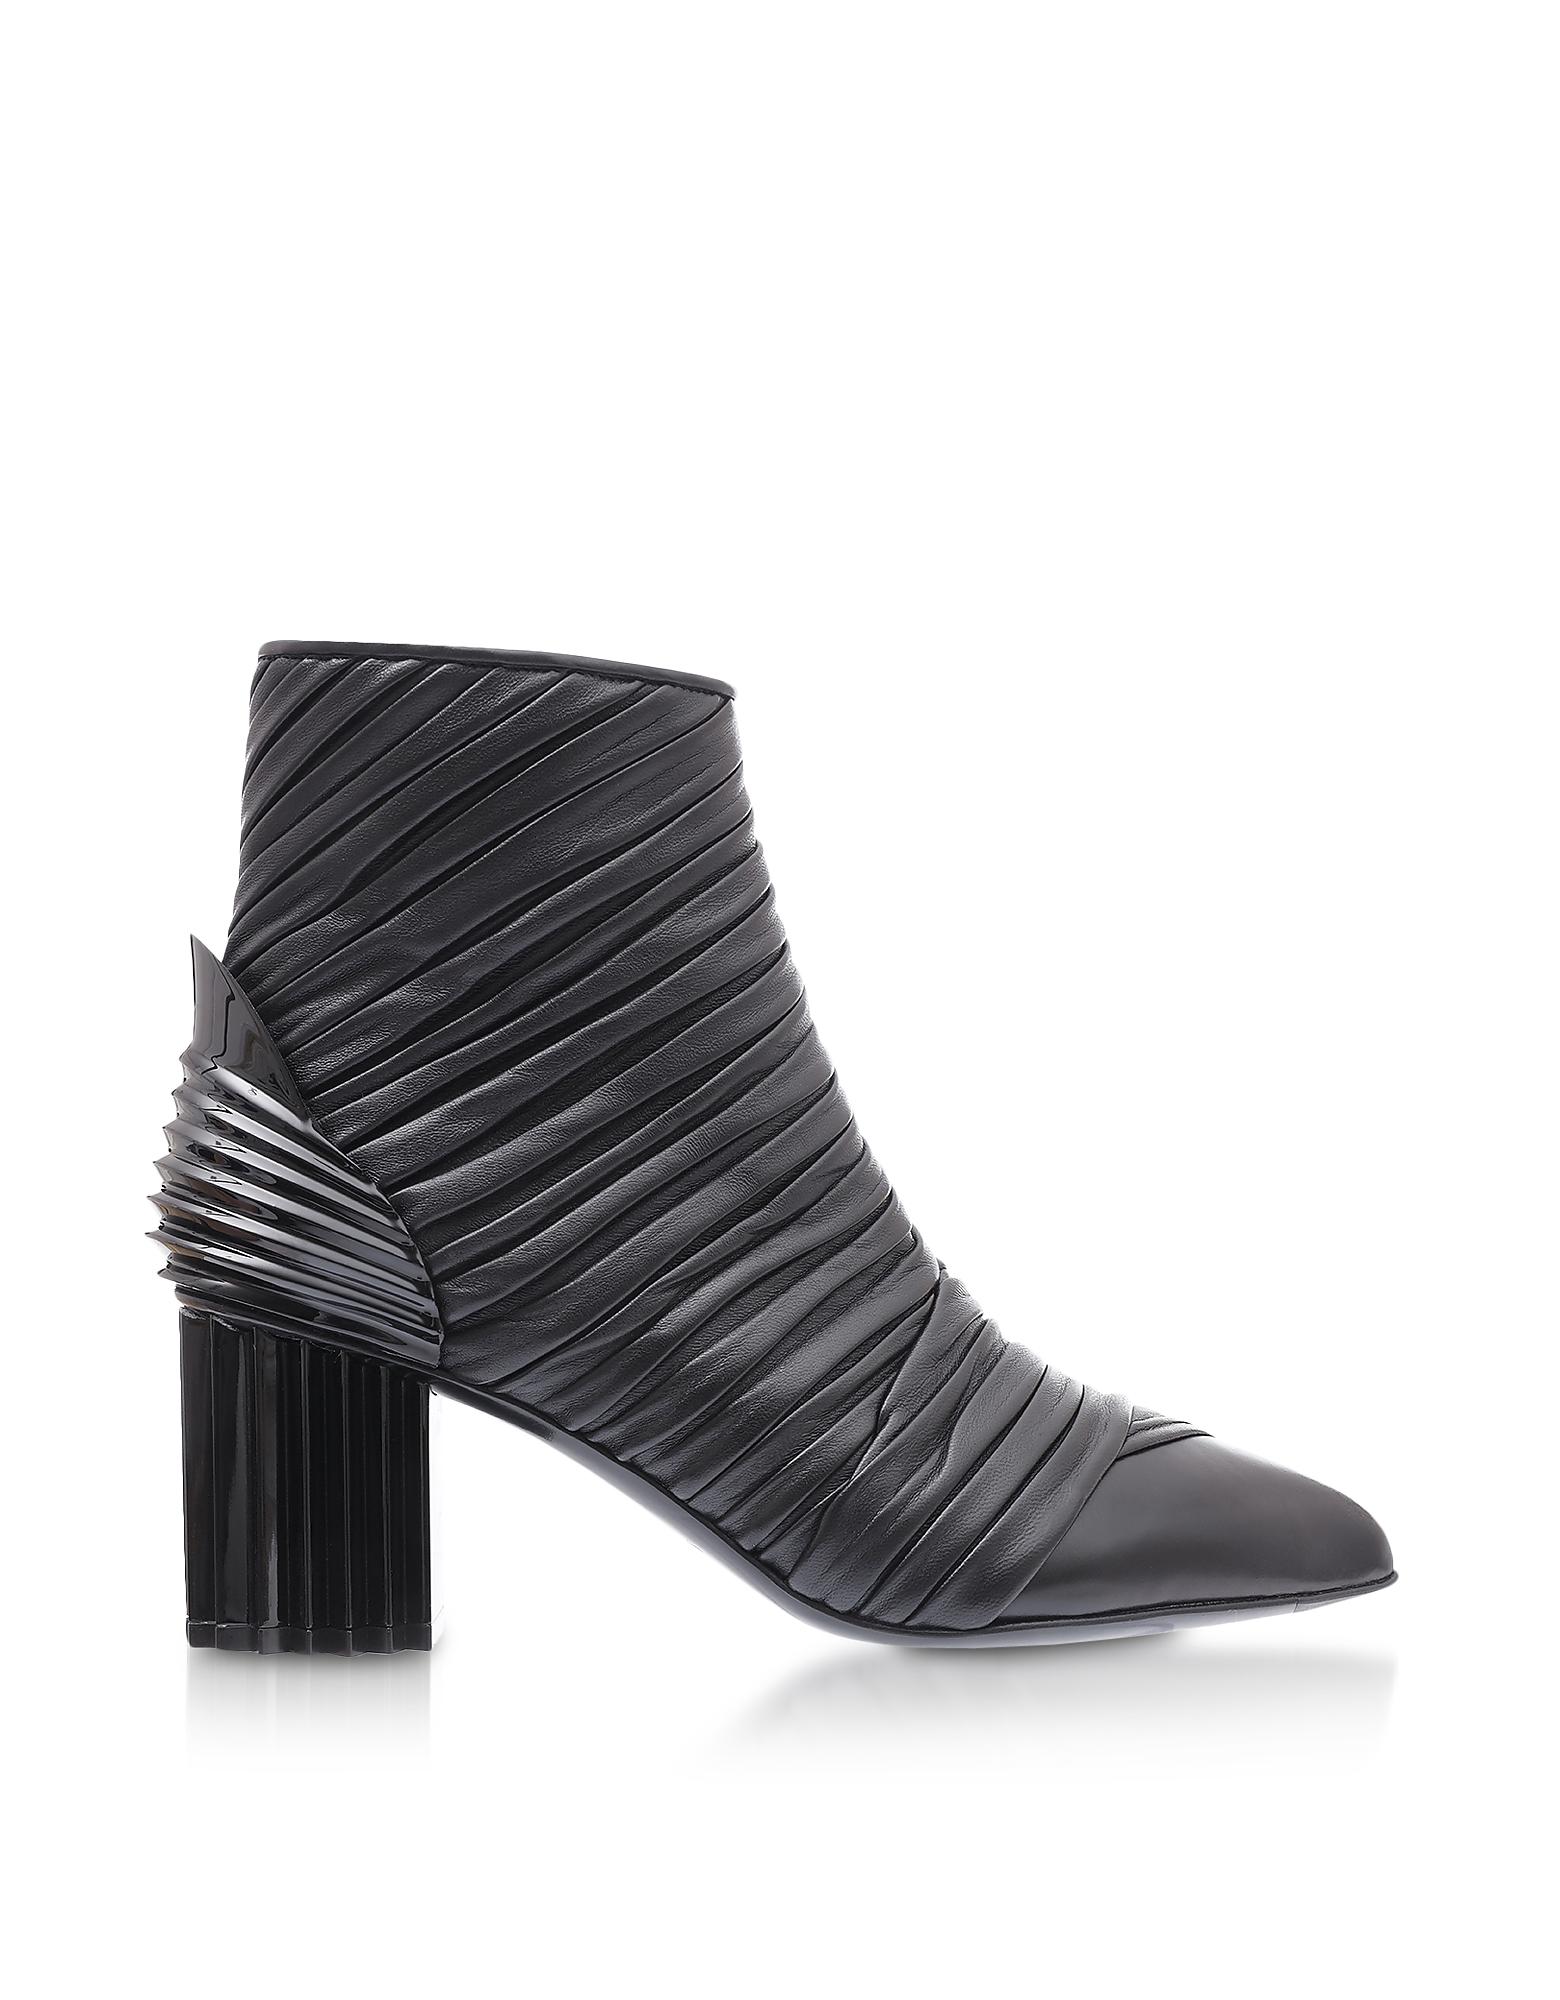 Balmain Shoes, Ilma Black Pleated Leather Heel Booties